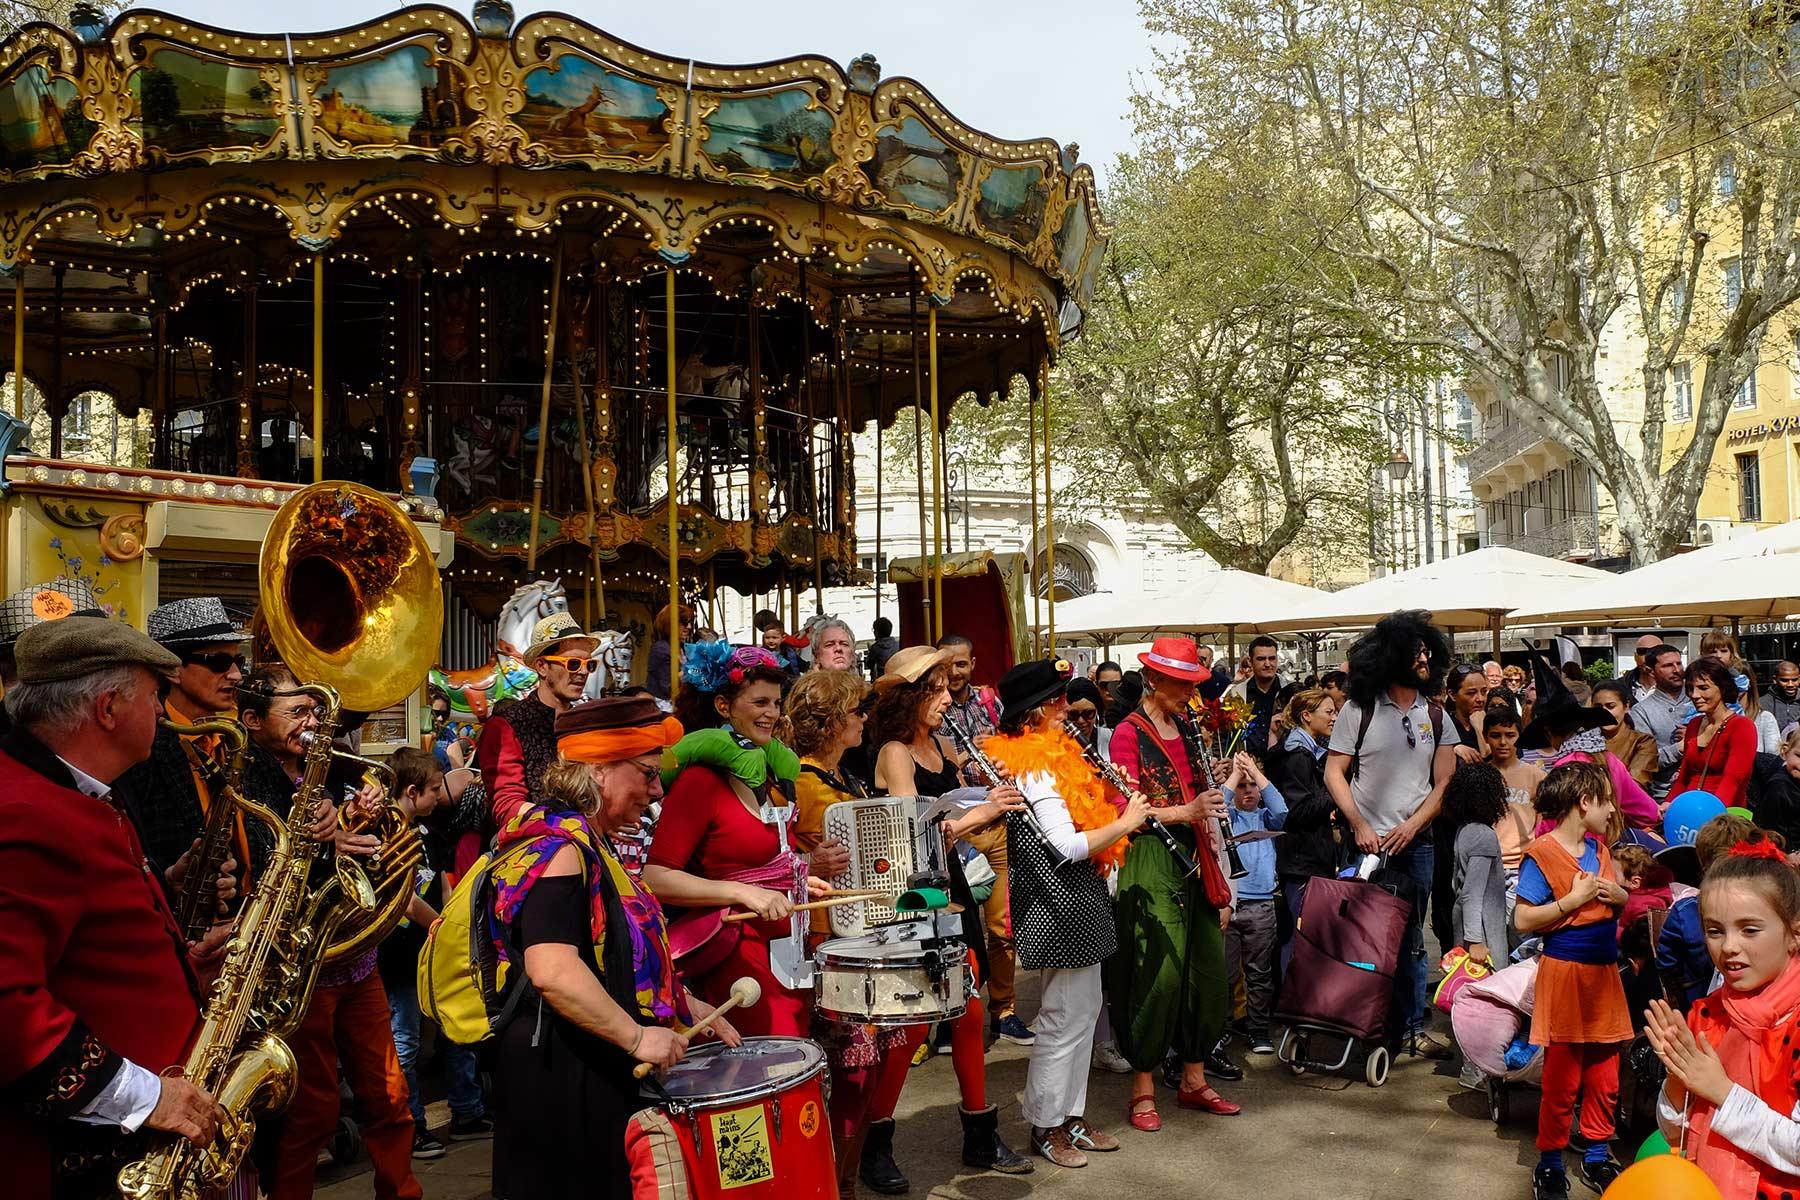 Straßenfest Festo Pitcho in Avignon, Frankreich